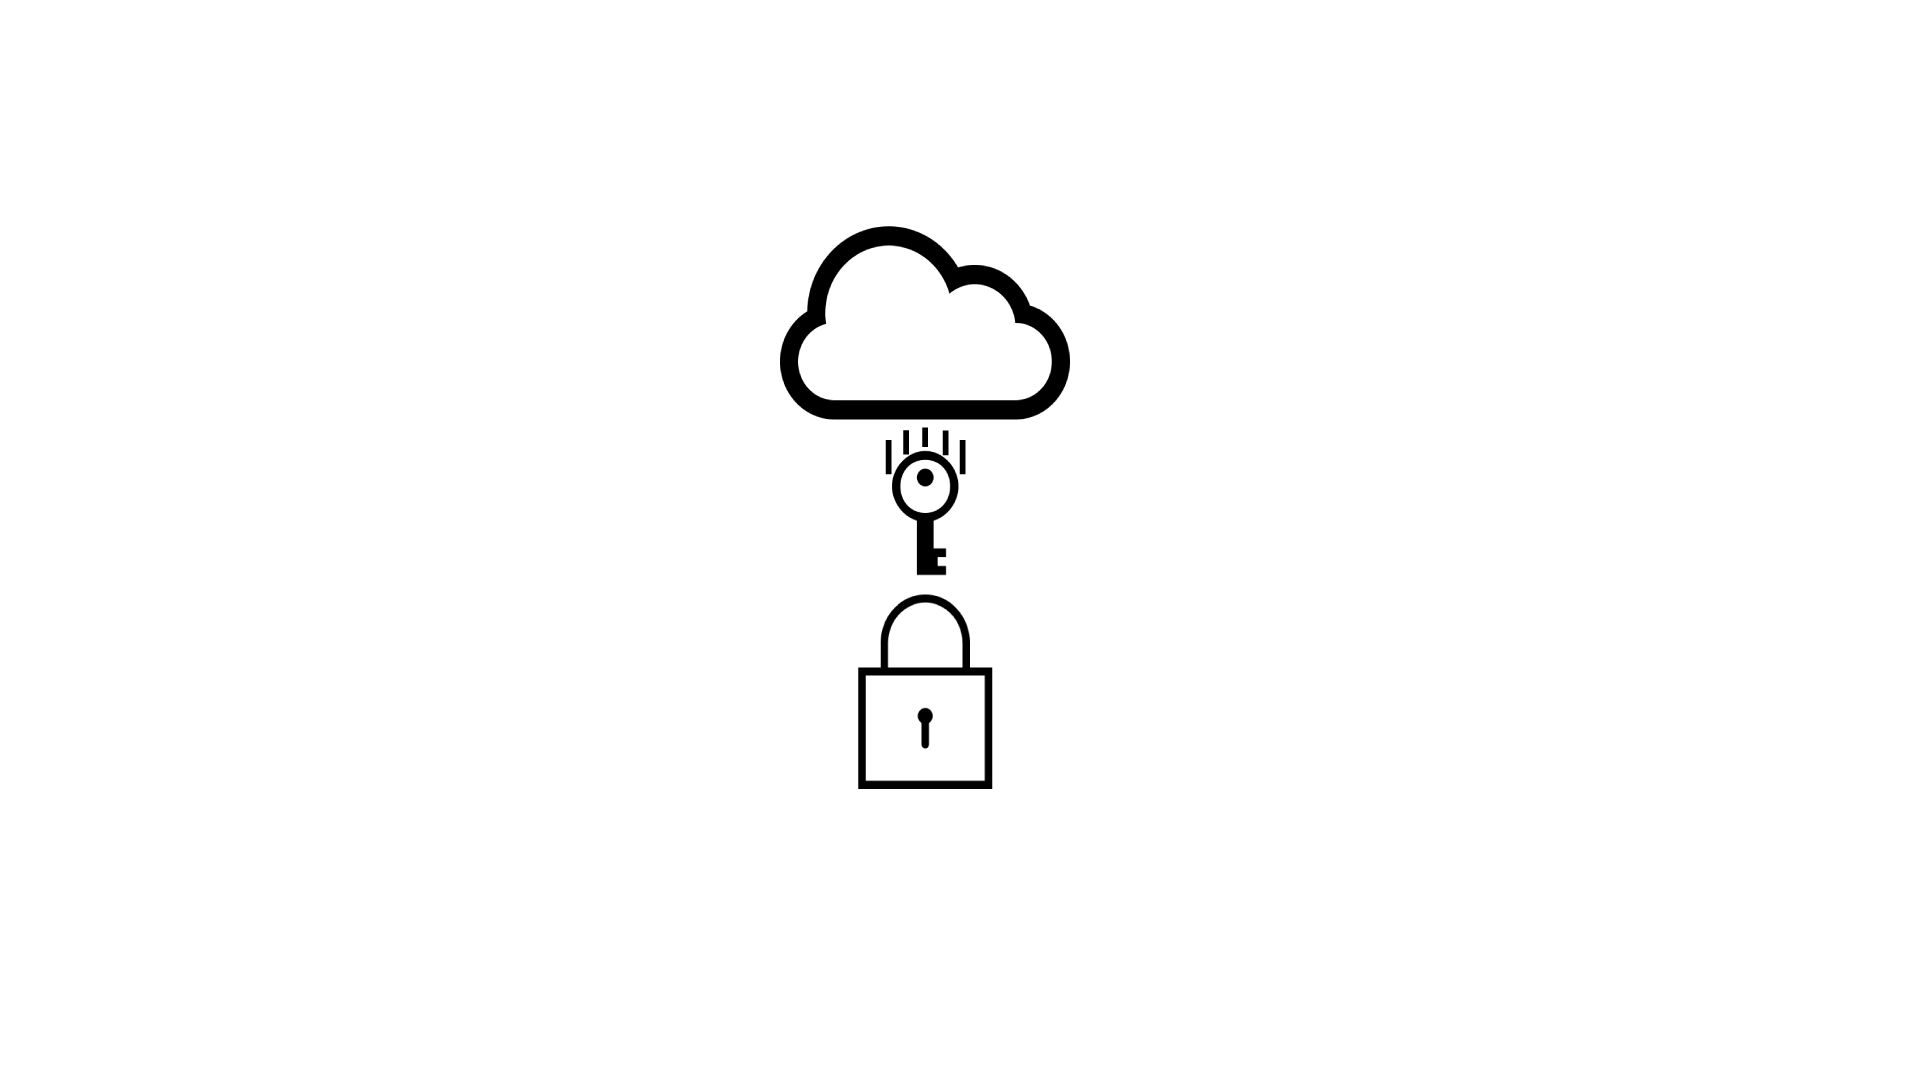 API Gateway & AWS Lambda for Authentication